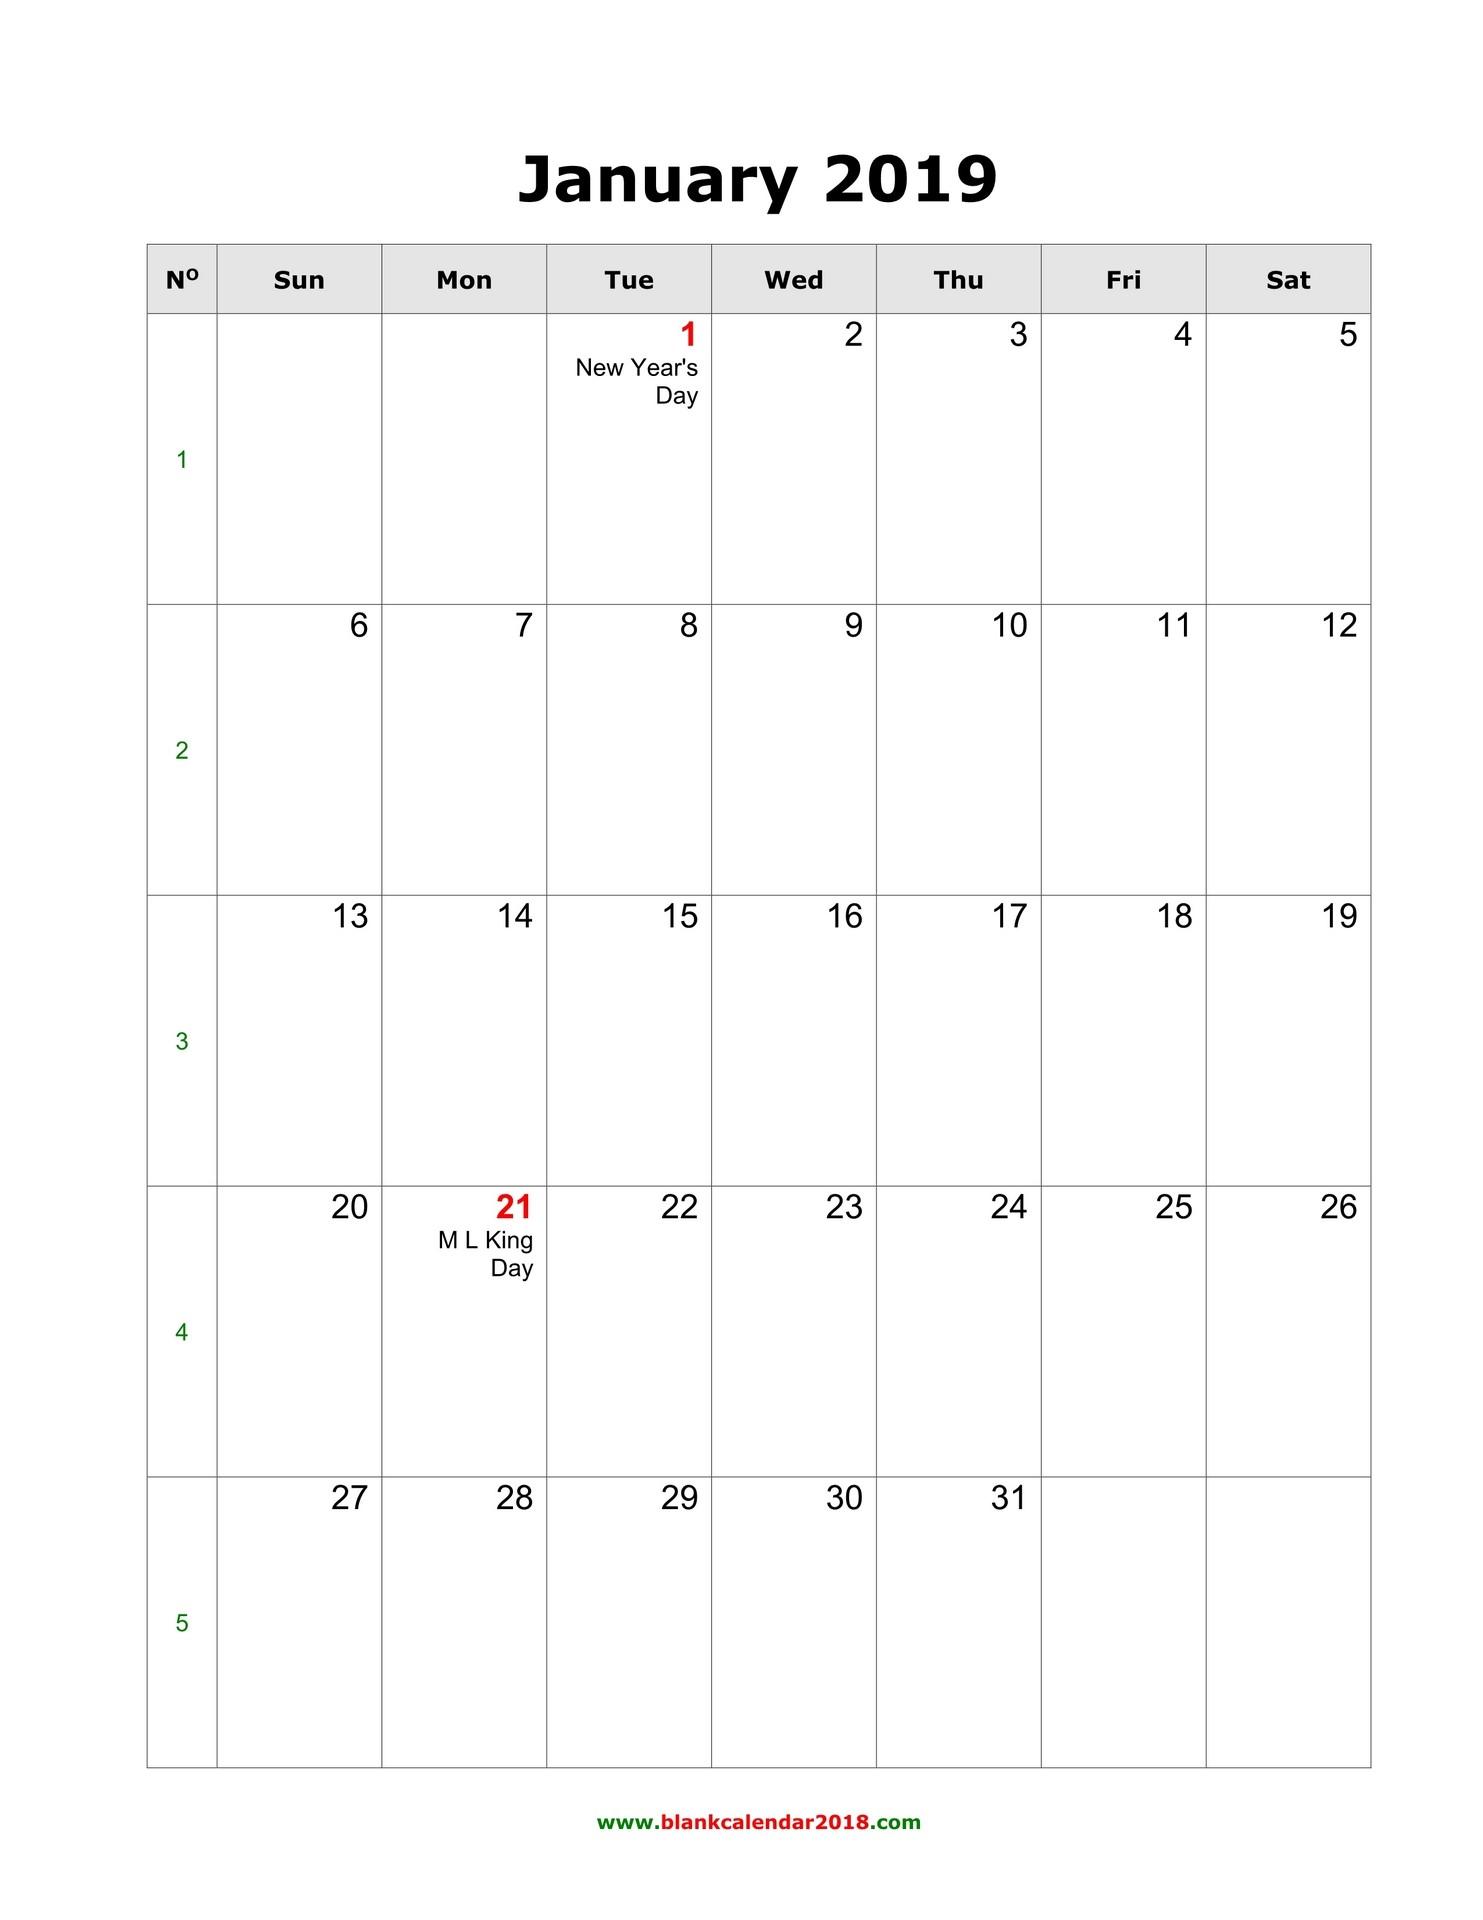 blank monthly holidays calendar 2019 portrait